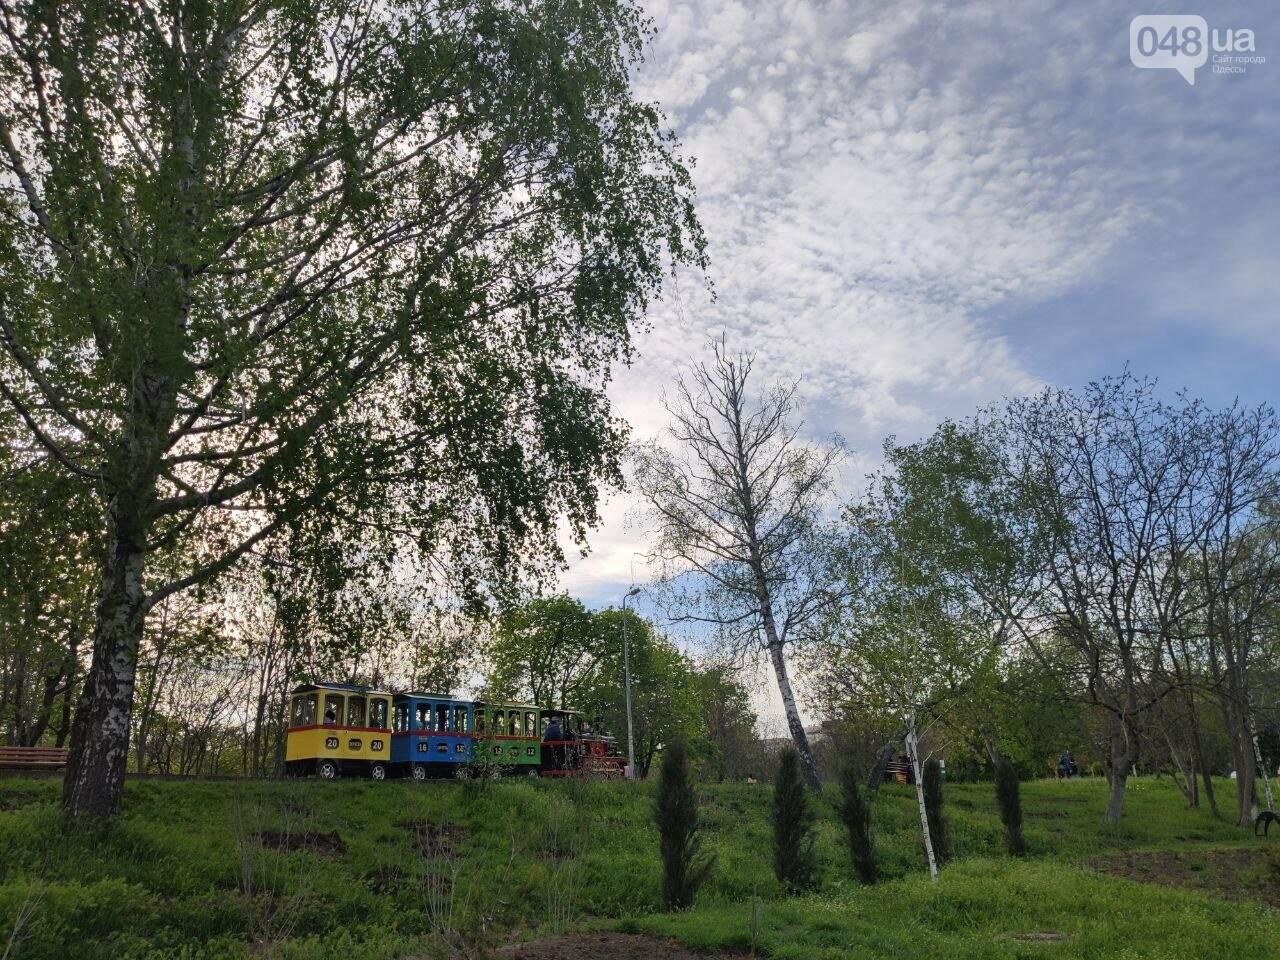 Сакура, лебеди и черепахи: сотни одесситов вышли на прогулку в парк Победы, - ФОТОРЕПОРТАЖ, фото-5